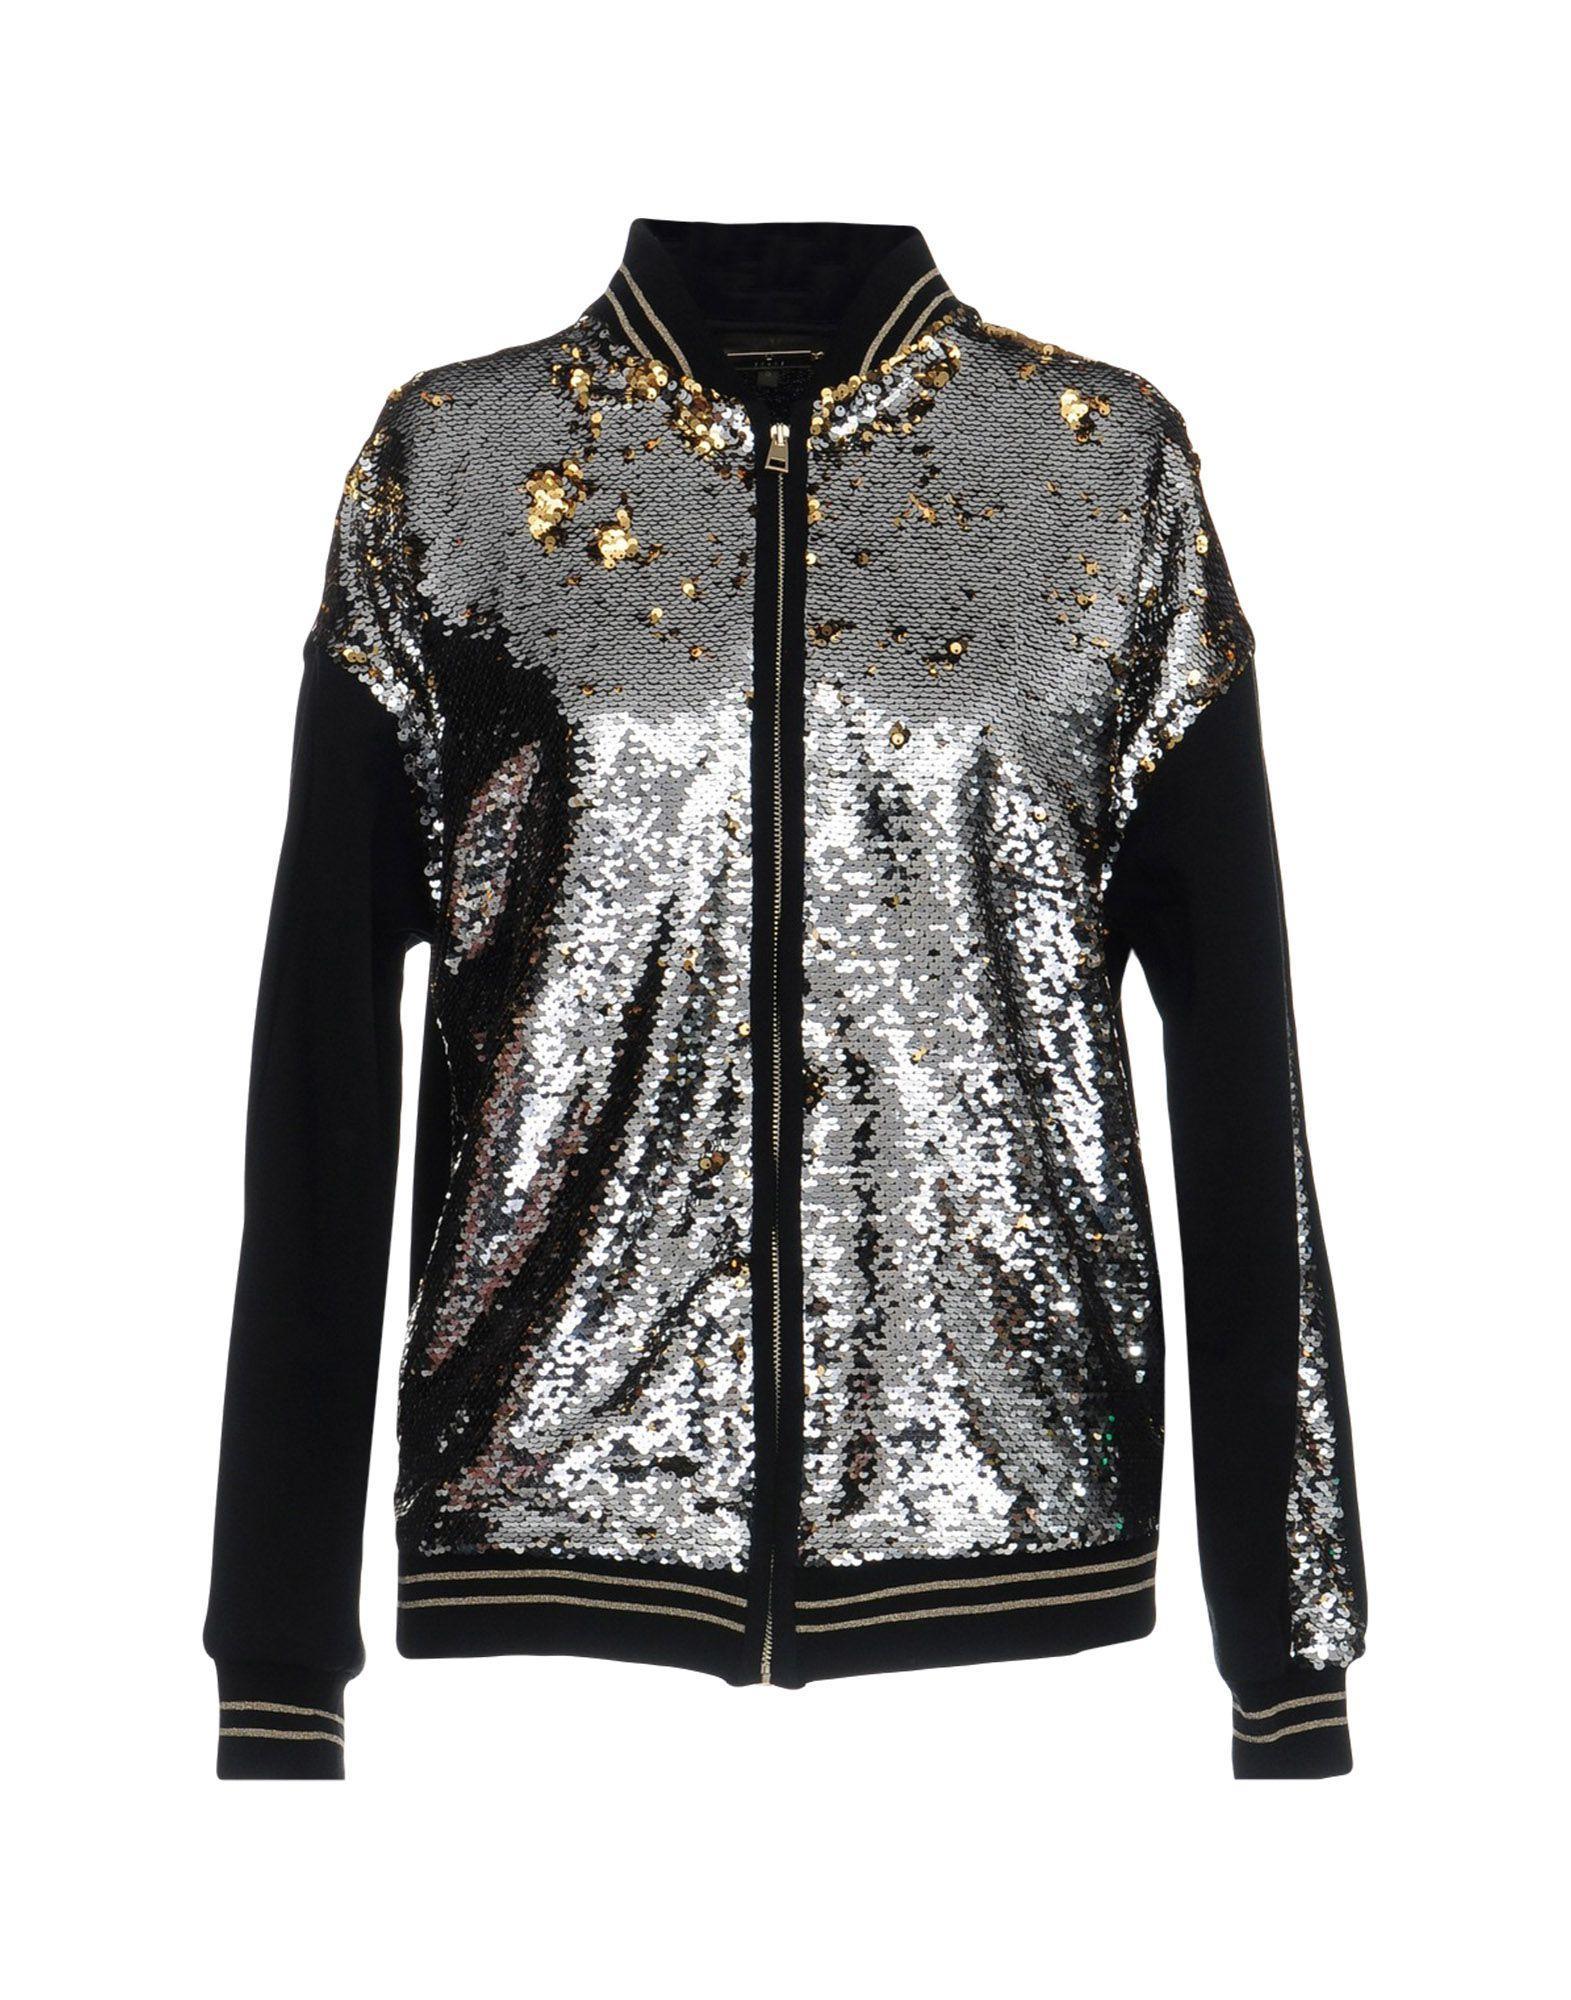 Space Style Concept Sweatshirt In Black